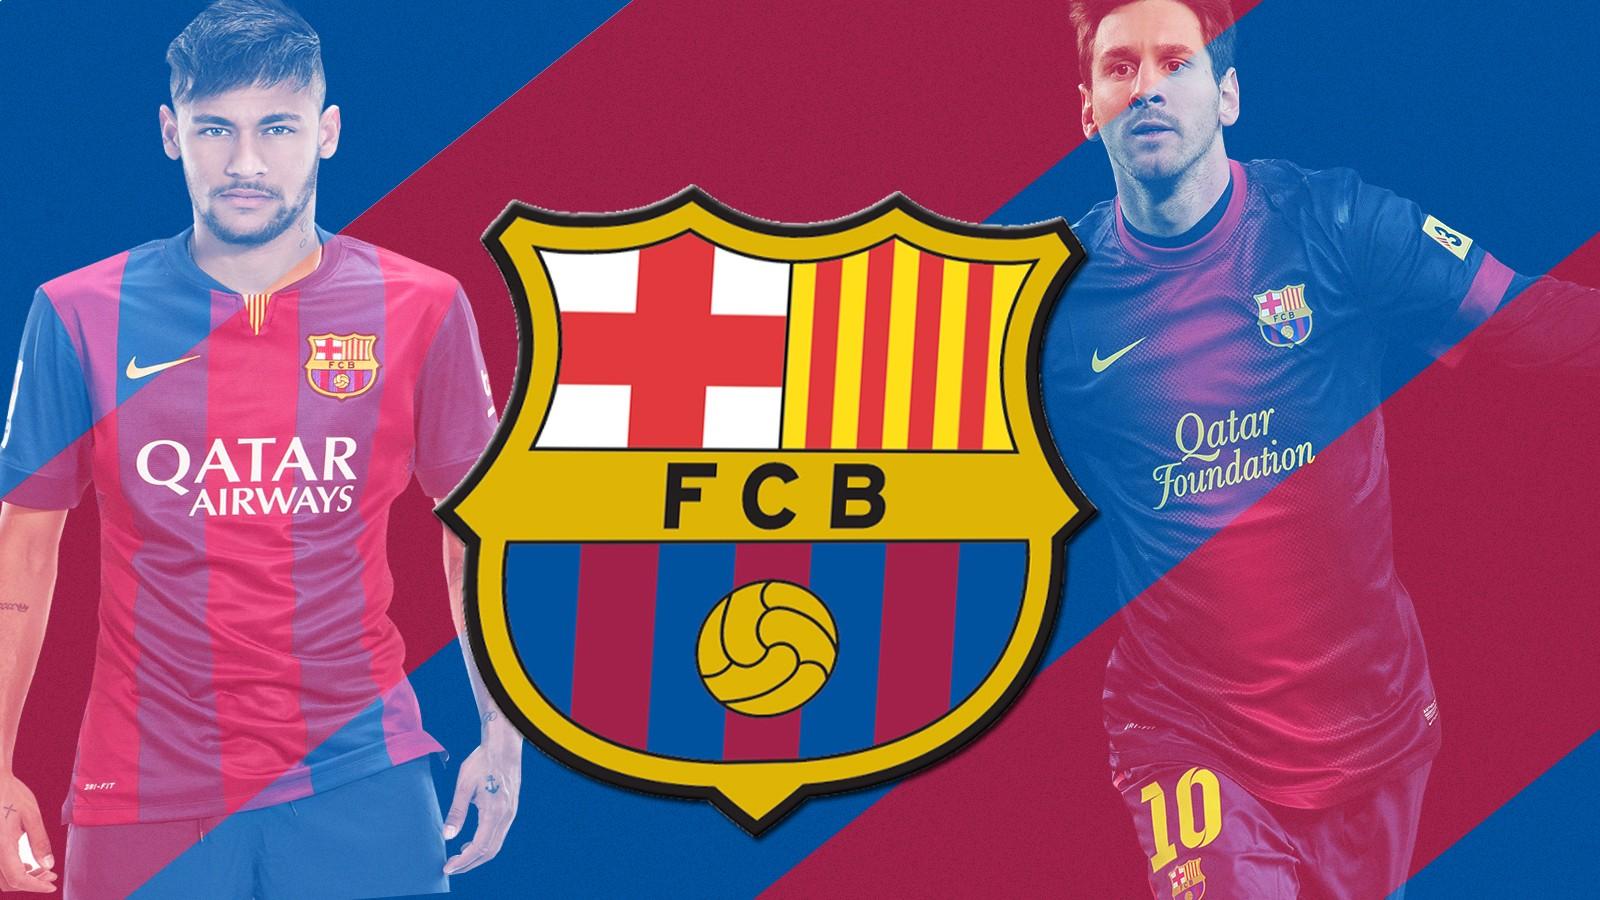 Wallpaper Olahraga Logo Tim Neymar Lionel Messi FC